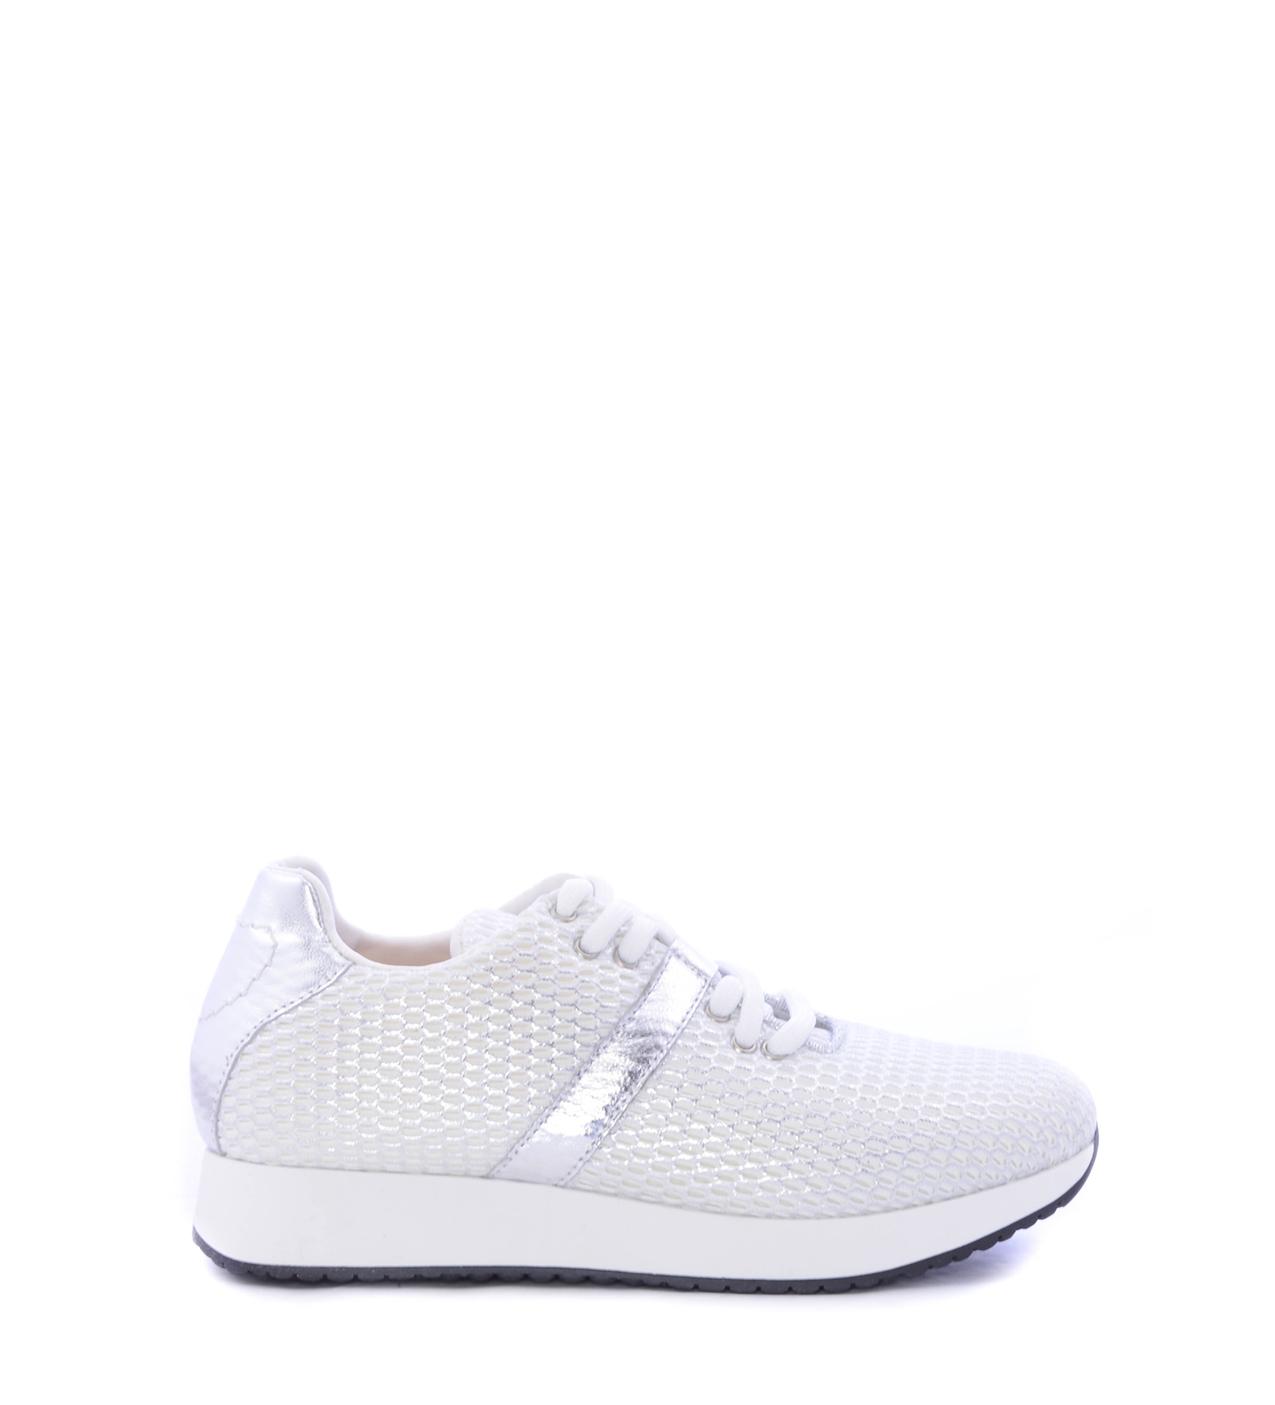 ffee368d451e BOLLICINE Λευκά Υφασμάτινα Casual - Glami.gr